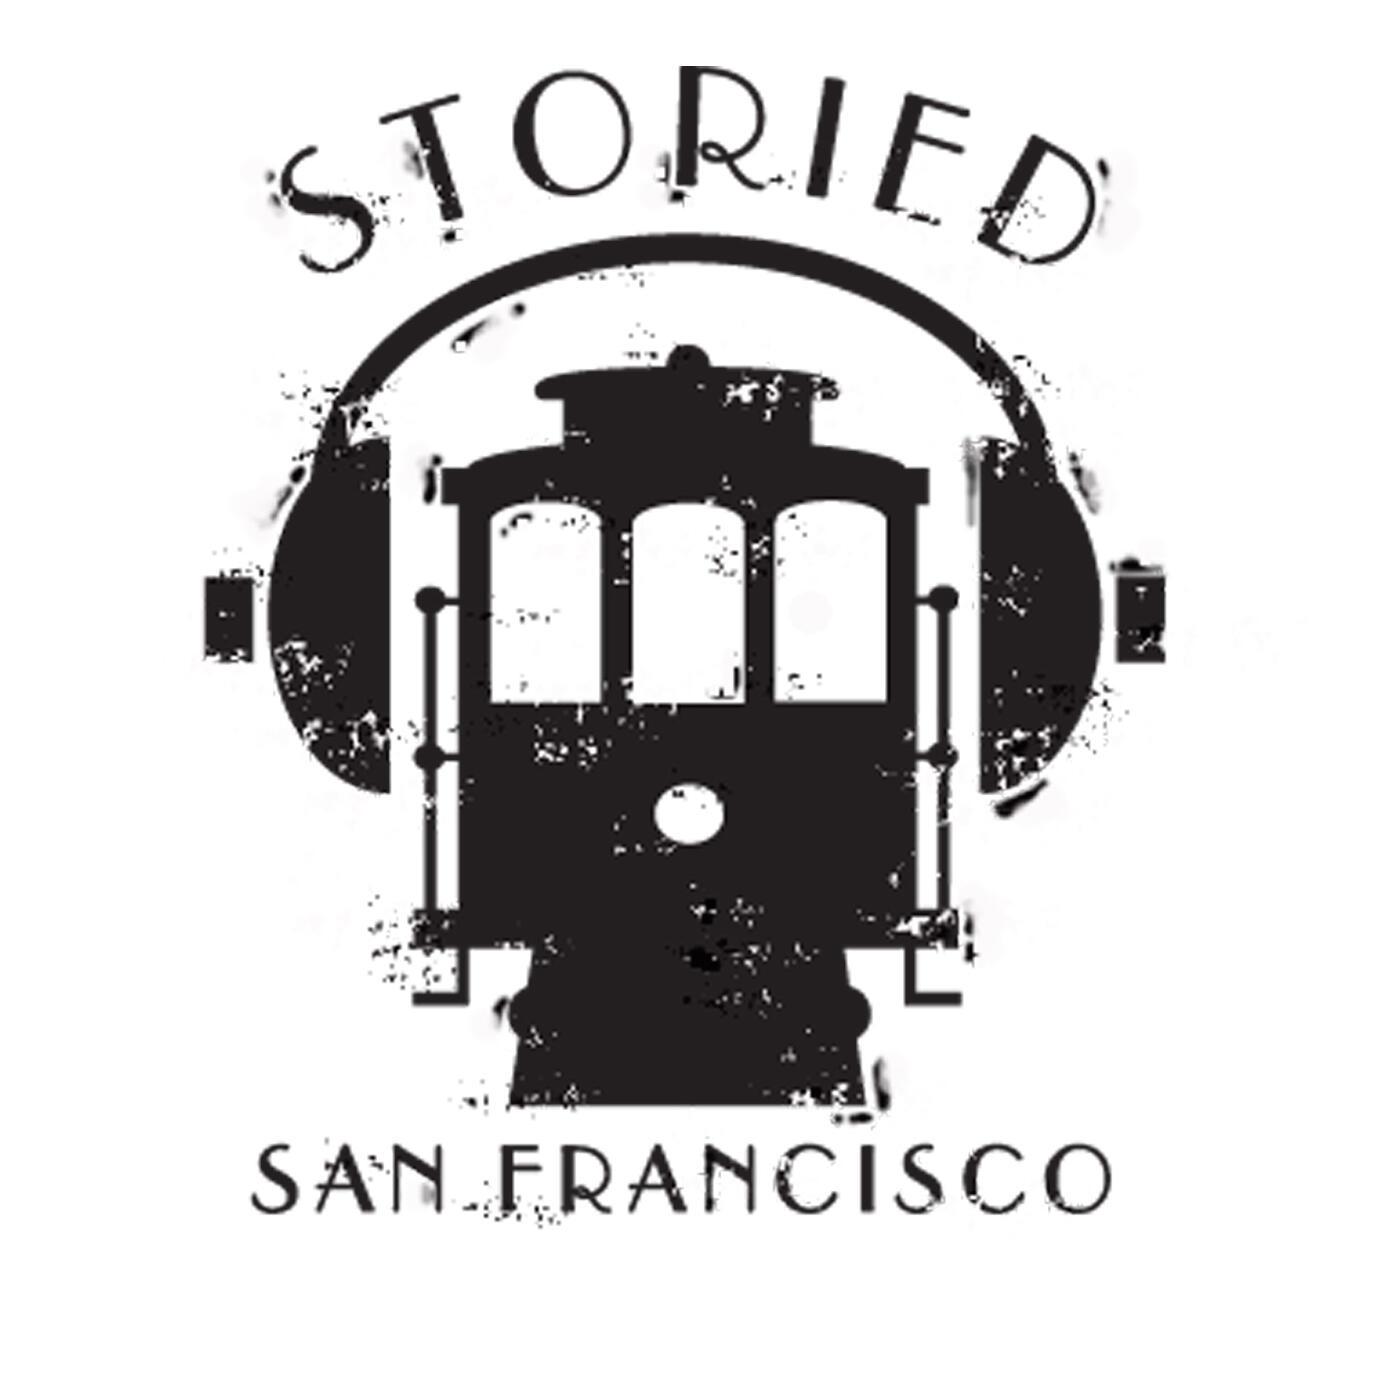 Storied: San Francisco